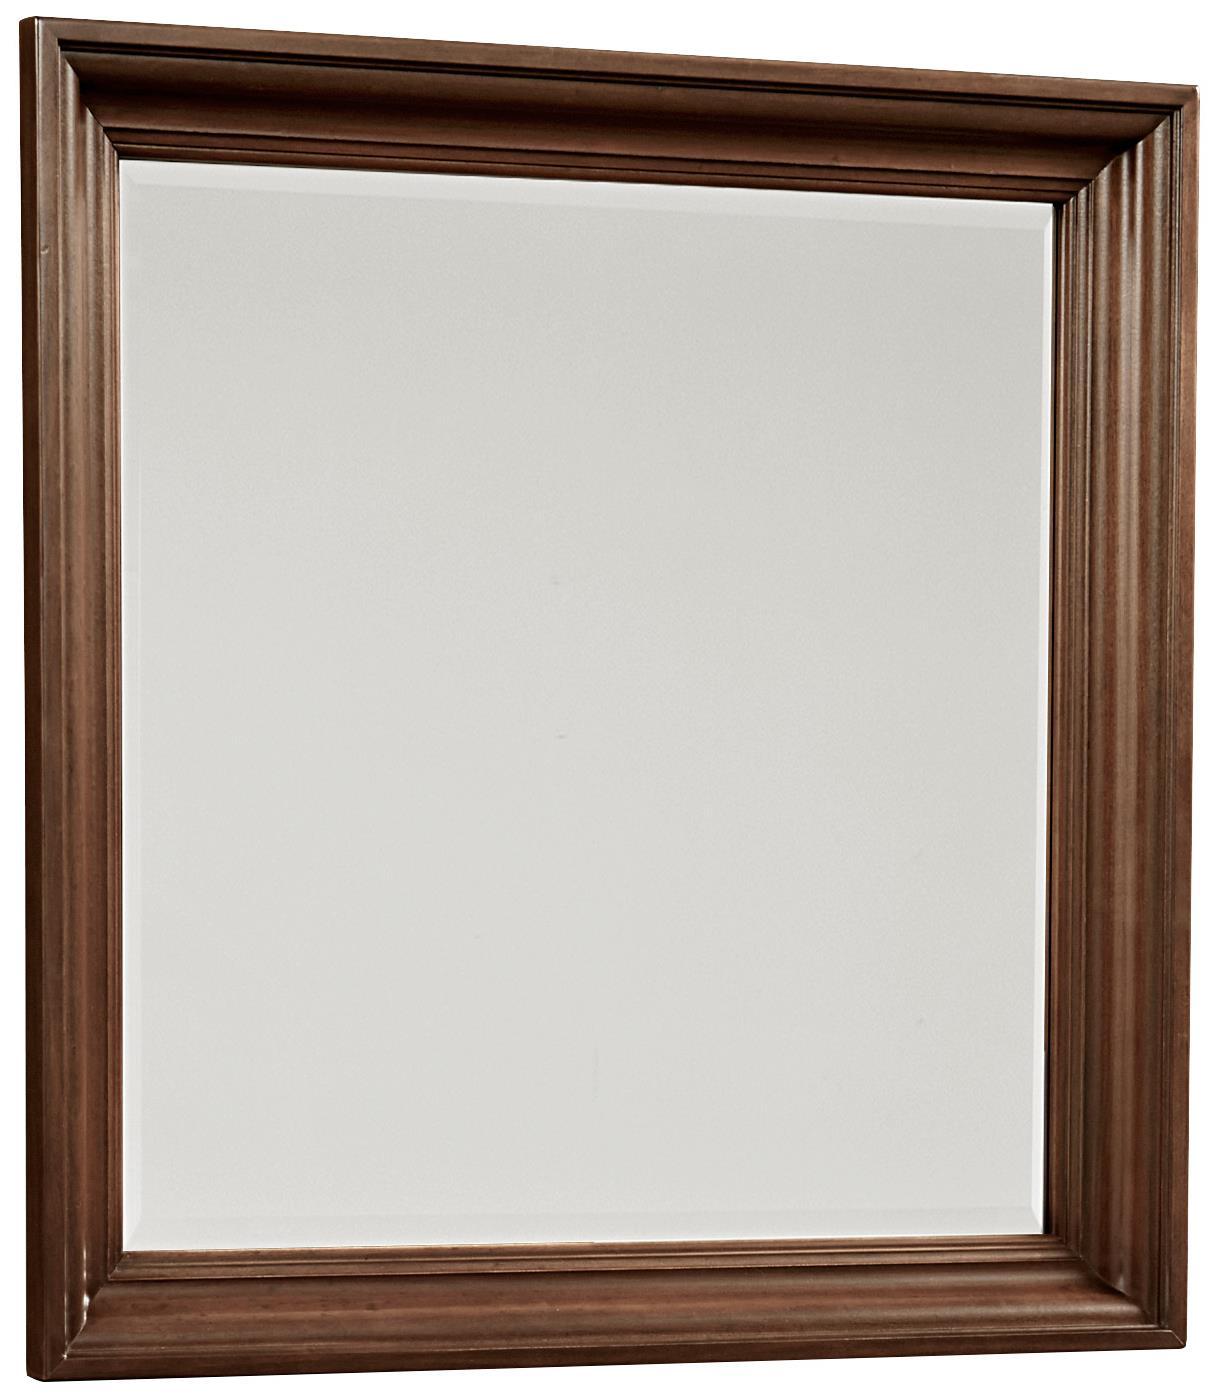 Vaughan Bassett Bedford Landscape Mirror - Item Number: BB89-445